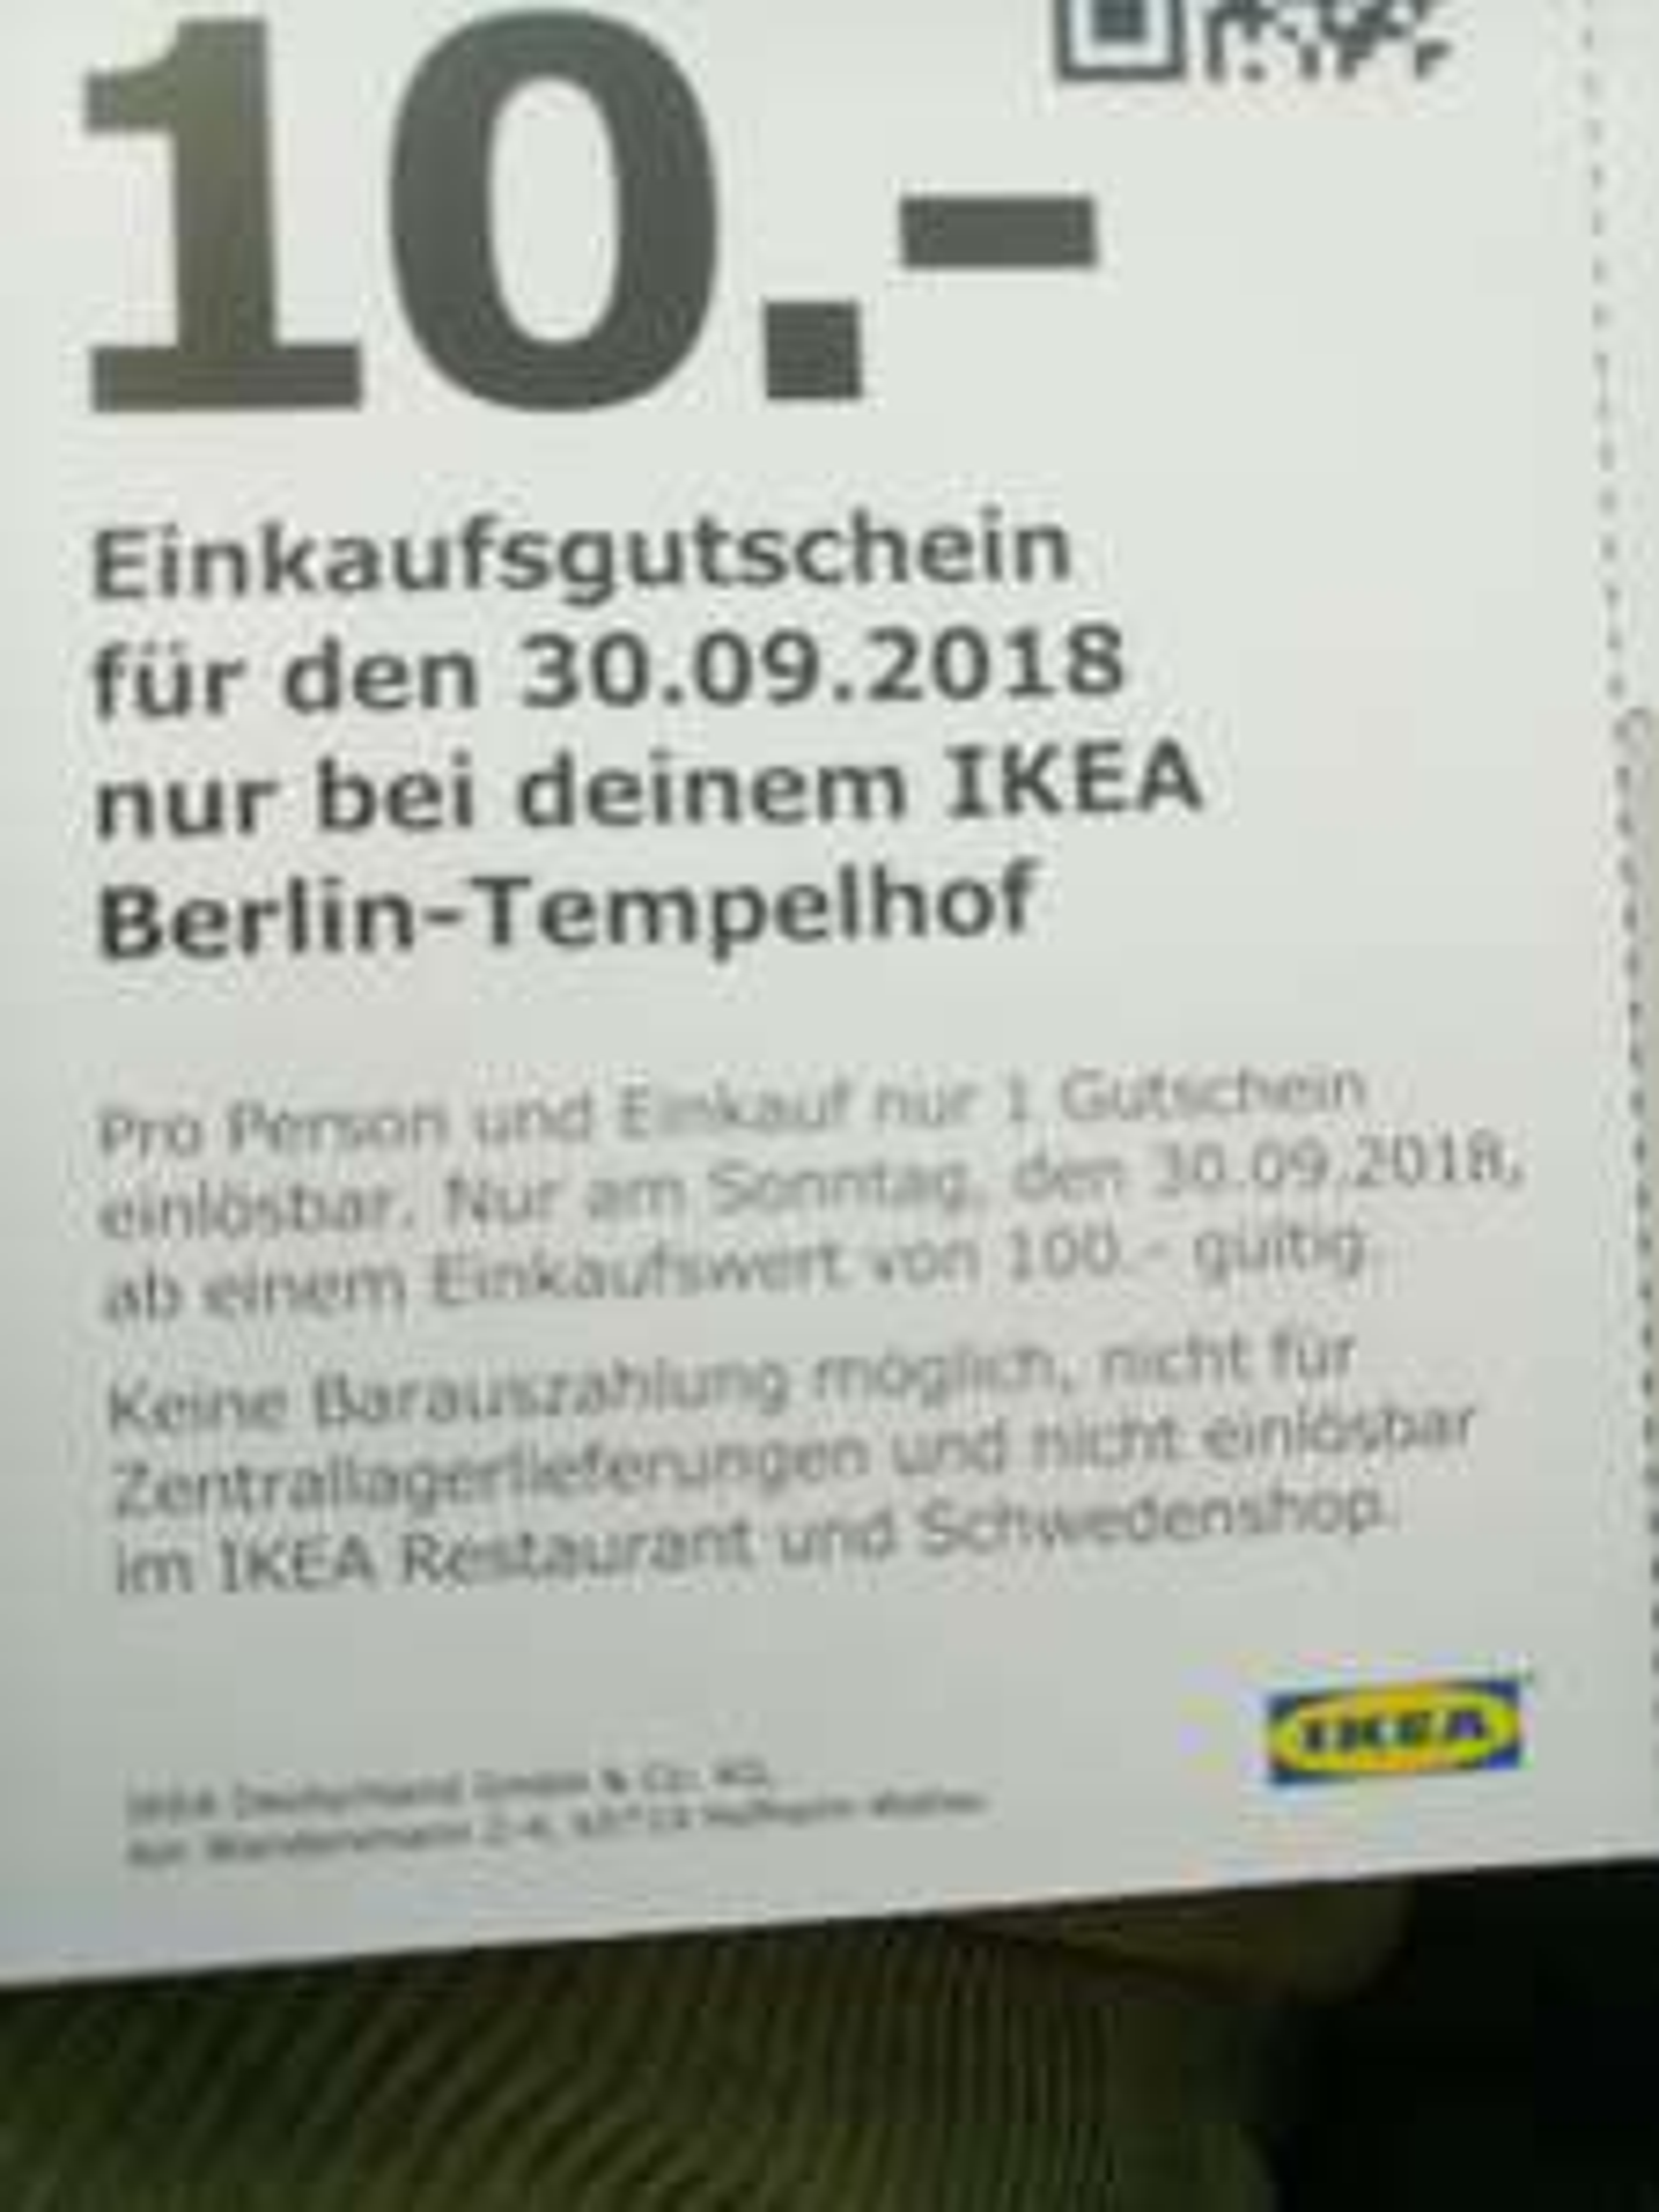 Ikea Berlin Tempelhof Sonntagsöffnung 30.09.2018 10€ // 100mew